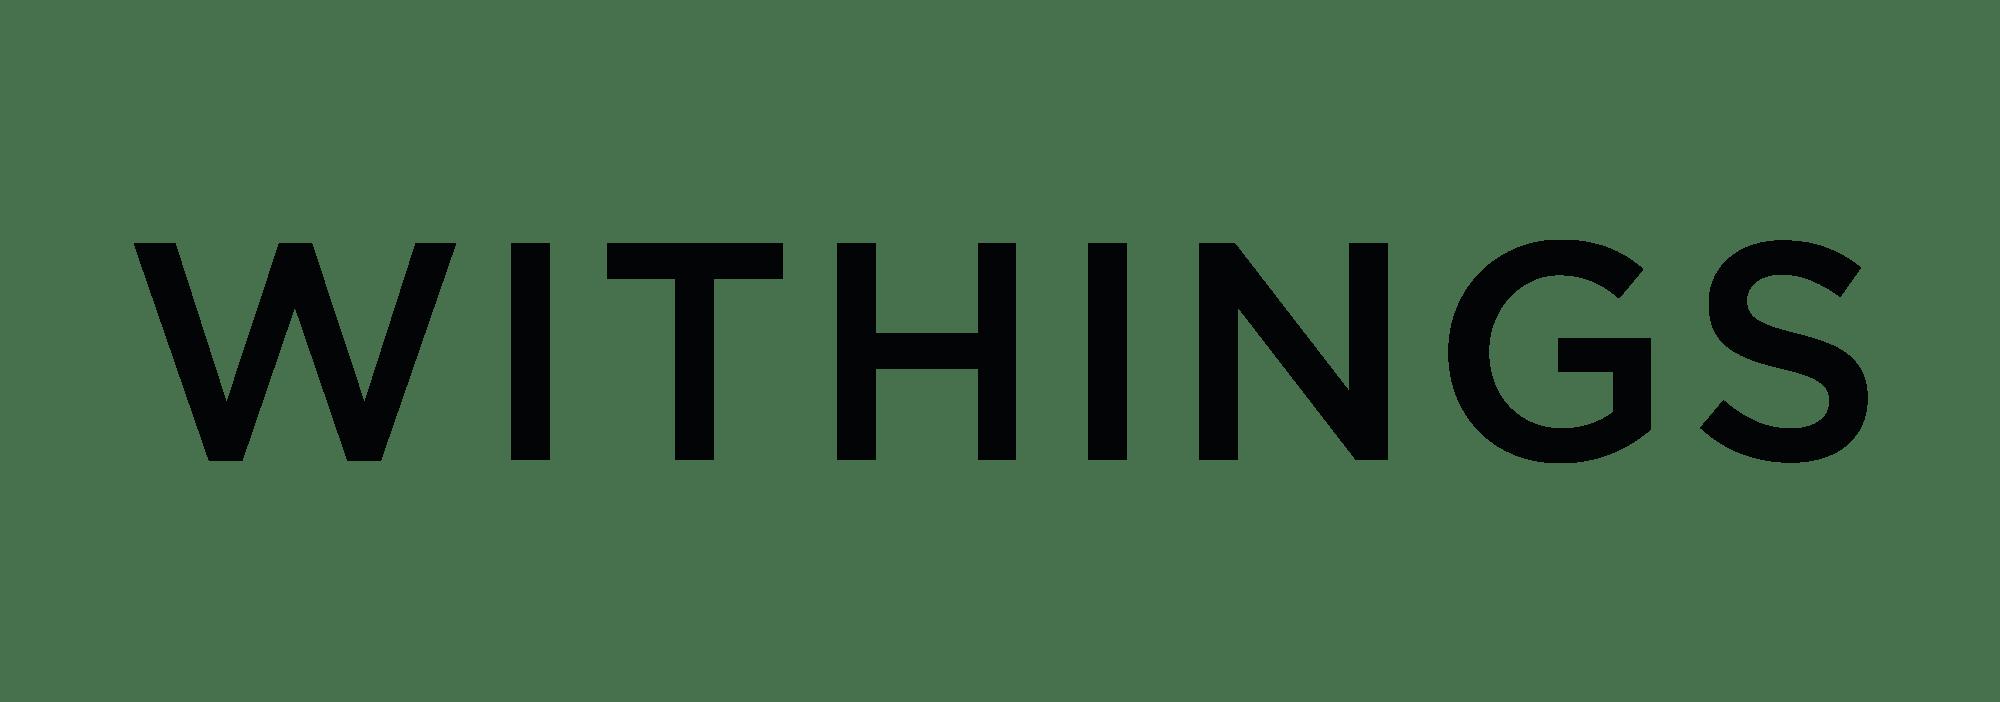 Withings Logo 2000x702